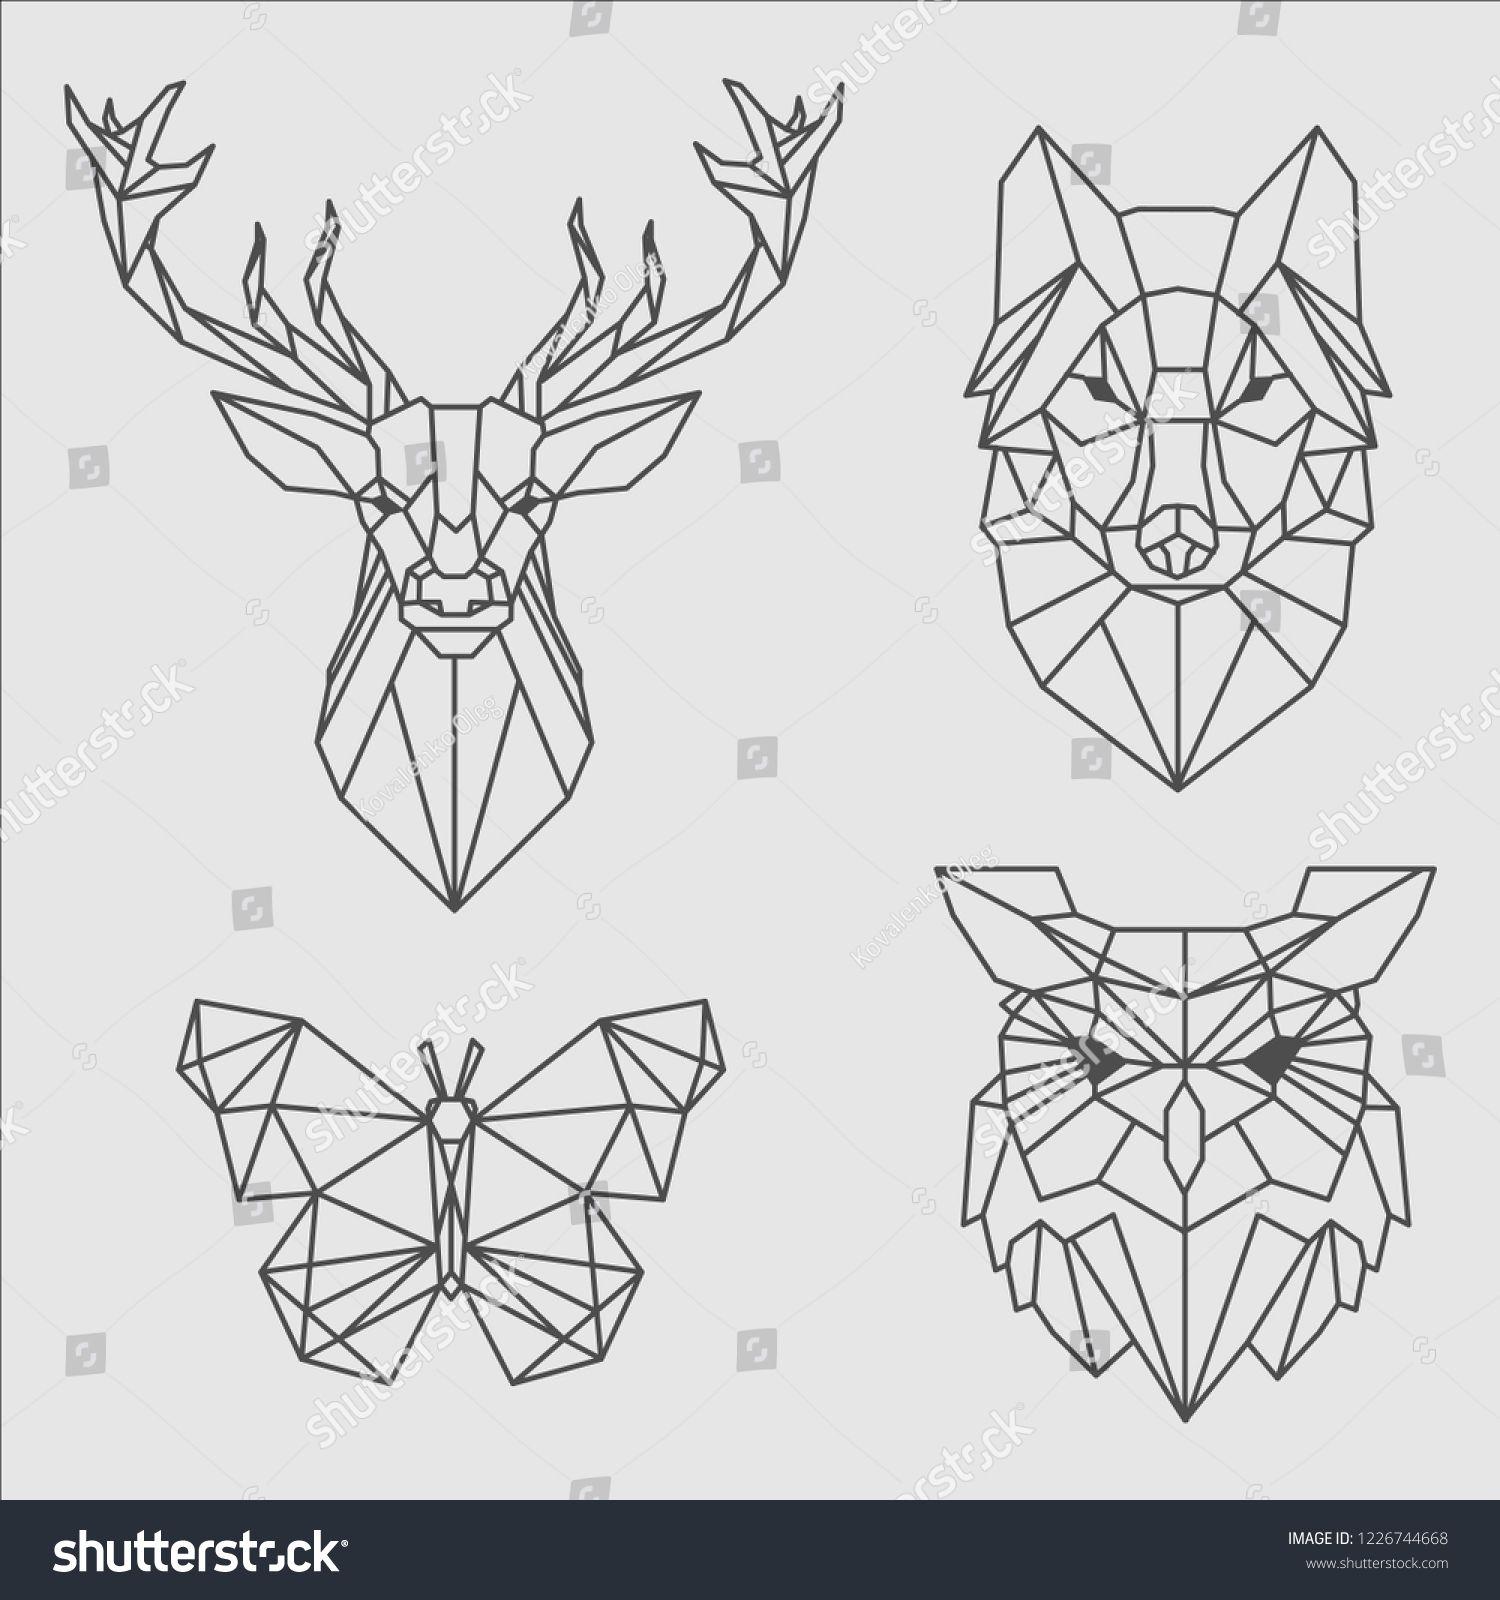 Pack Of Polygonal Animal Tattoos Ad Ad Polygonal Pack Tattoos Animal Geometric Drawing Geometric Animals Pixel Art